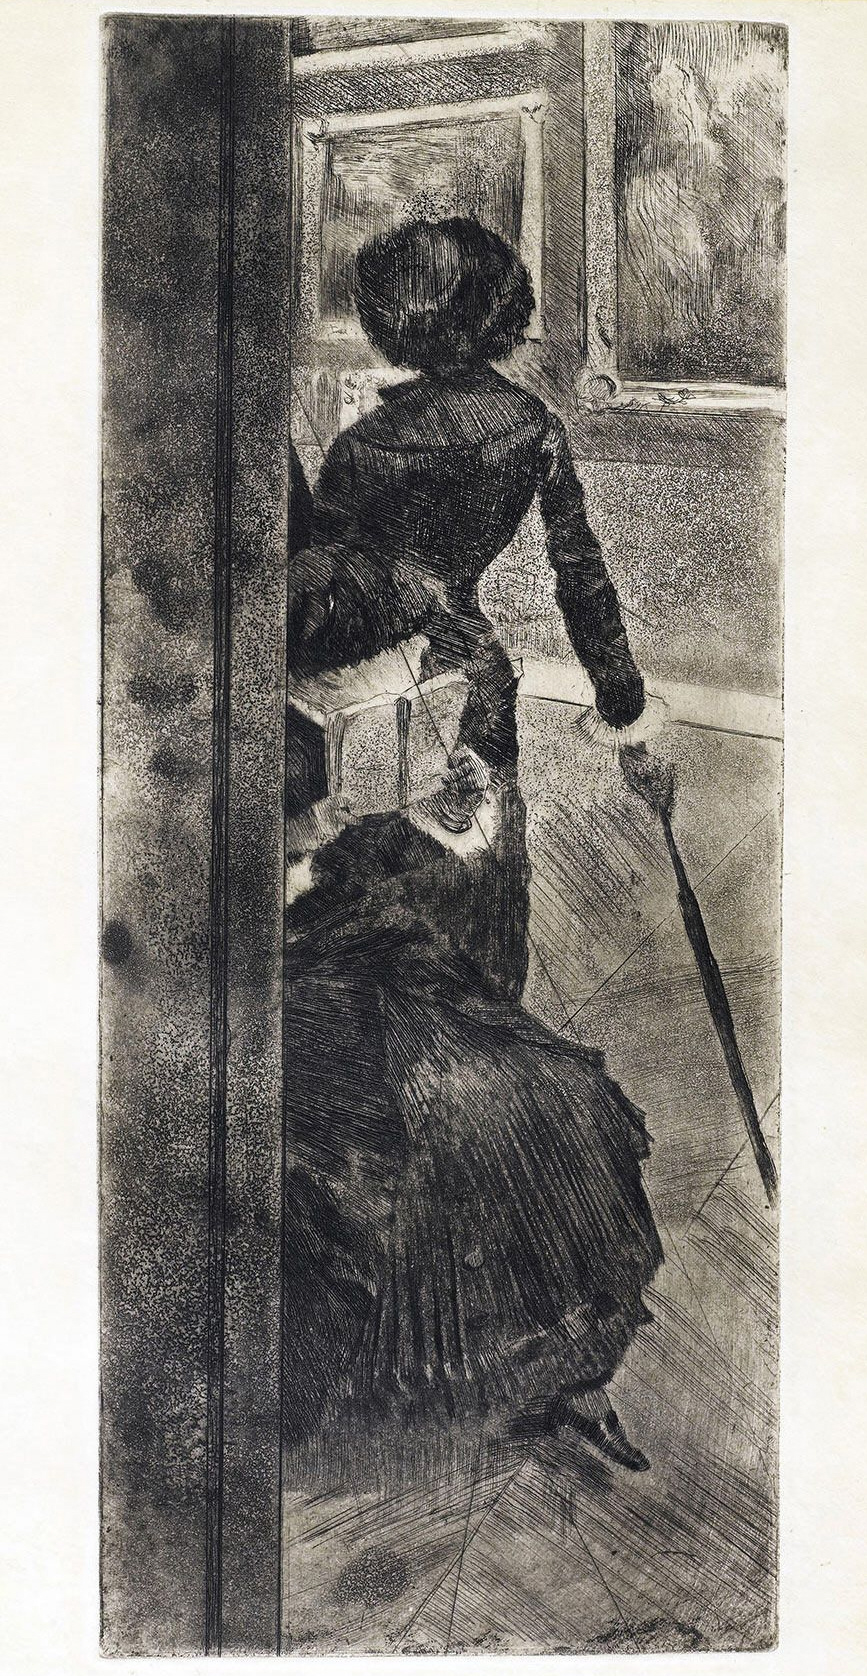 Edgar Degas Au Louvre la peinture (Mary Cassatt) c1879-1880 - Strichätzung mit Abdecklack, Aquatinta